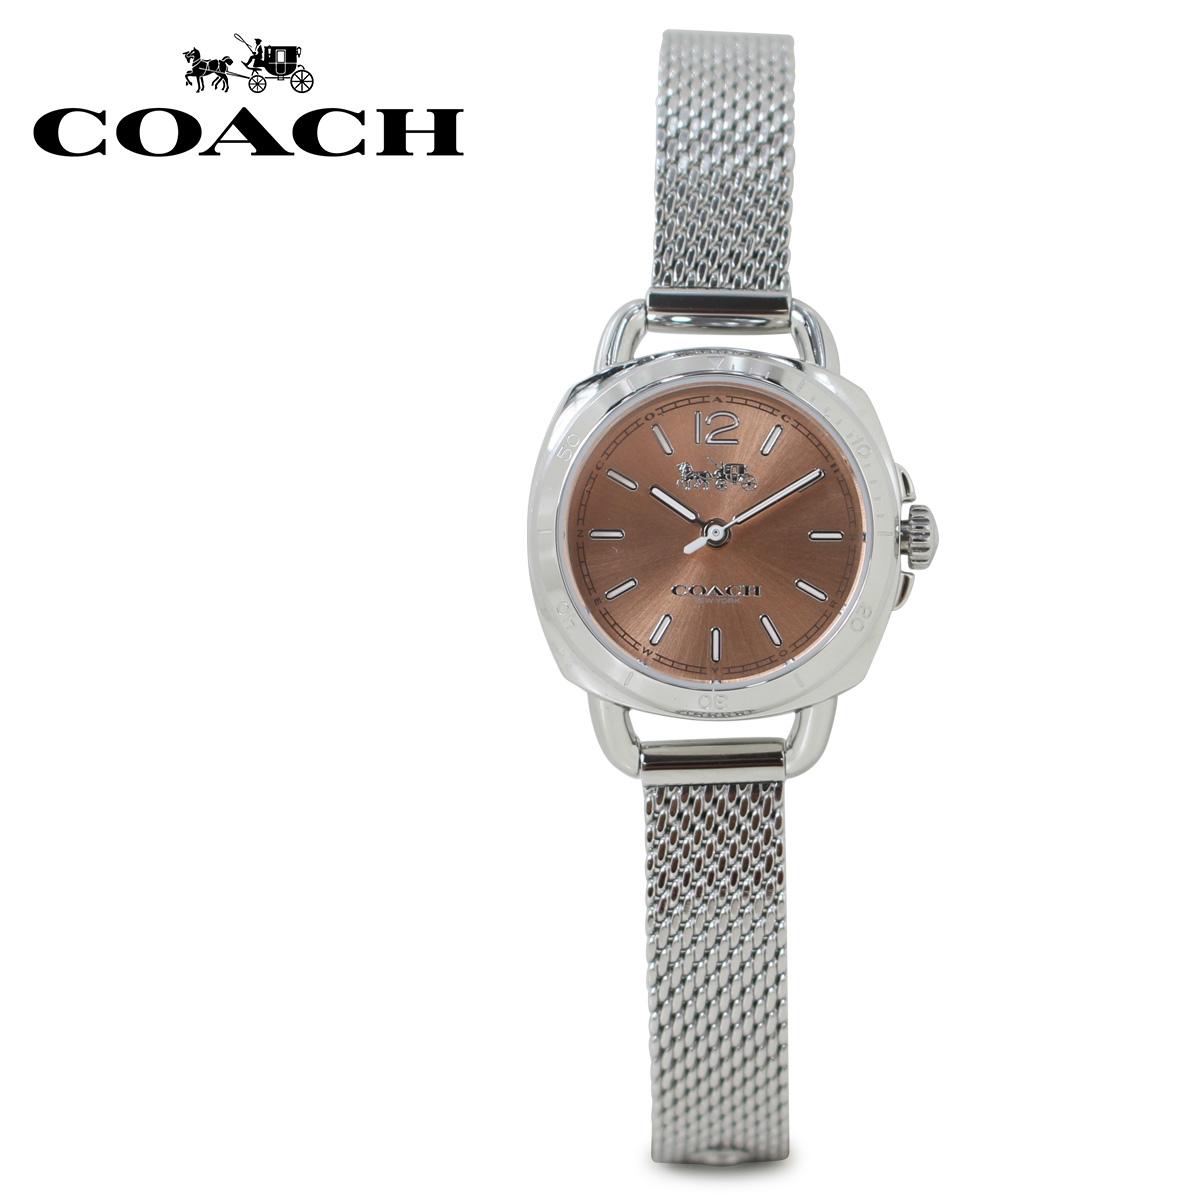 COACH 14502631 コーチ 腕時計 レディース シルバー